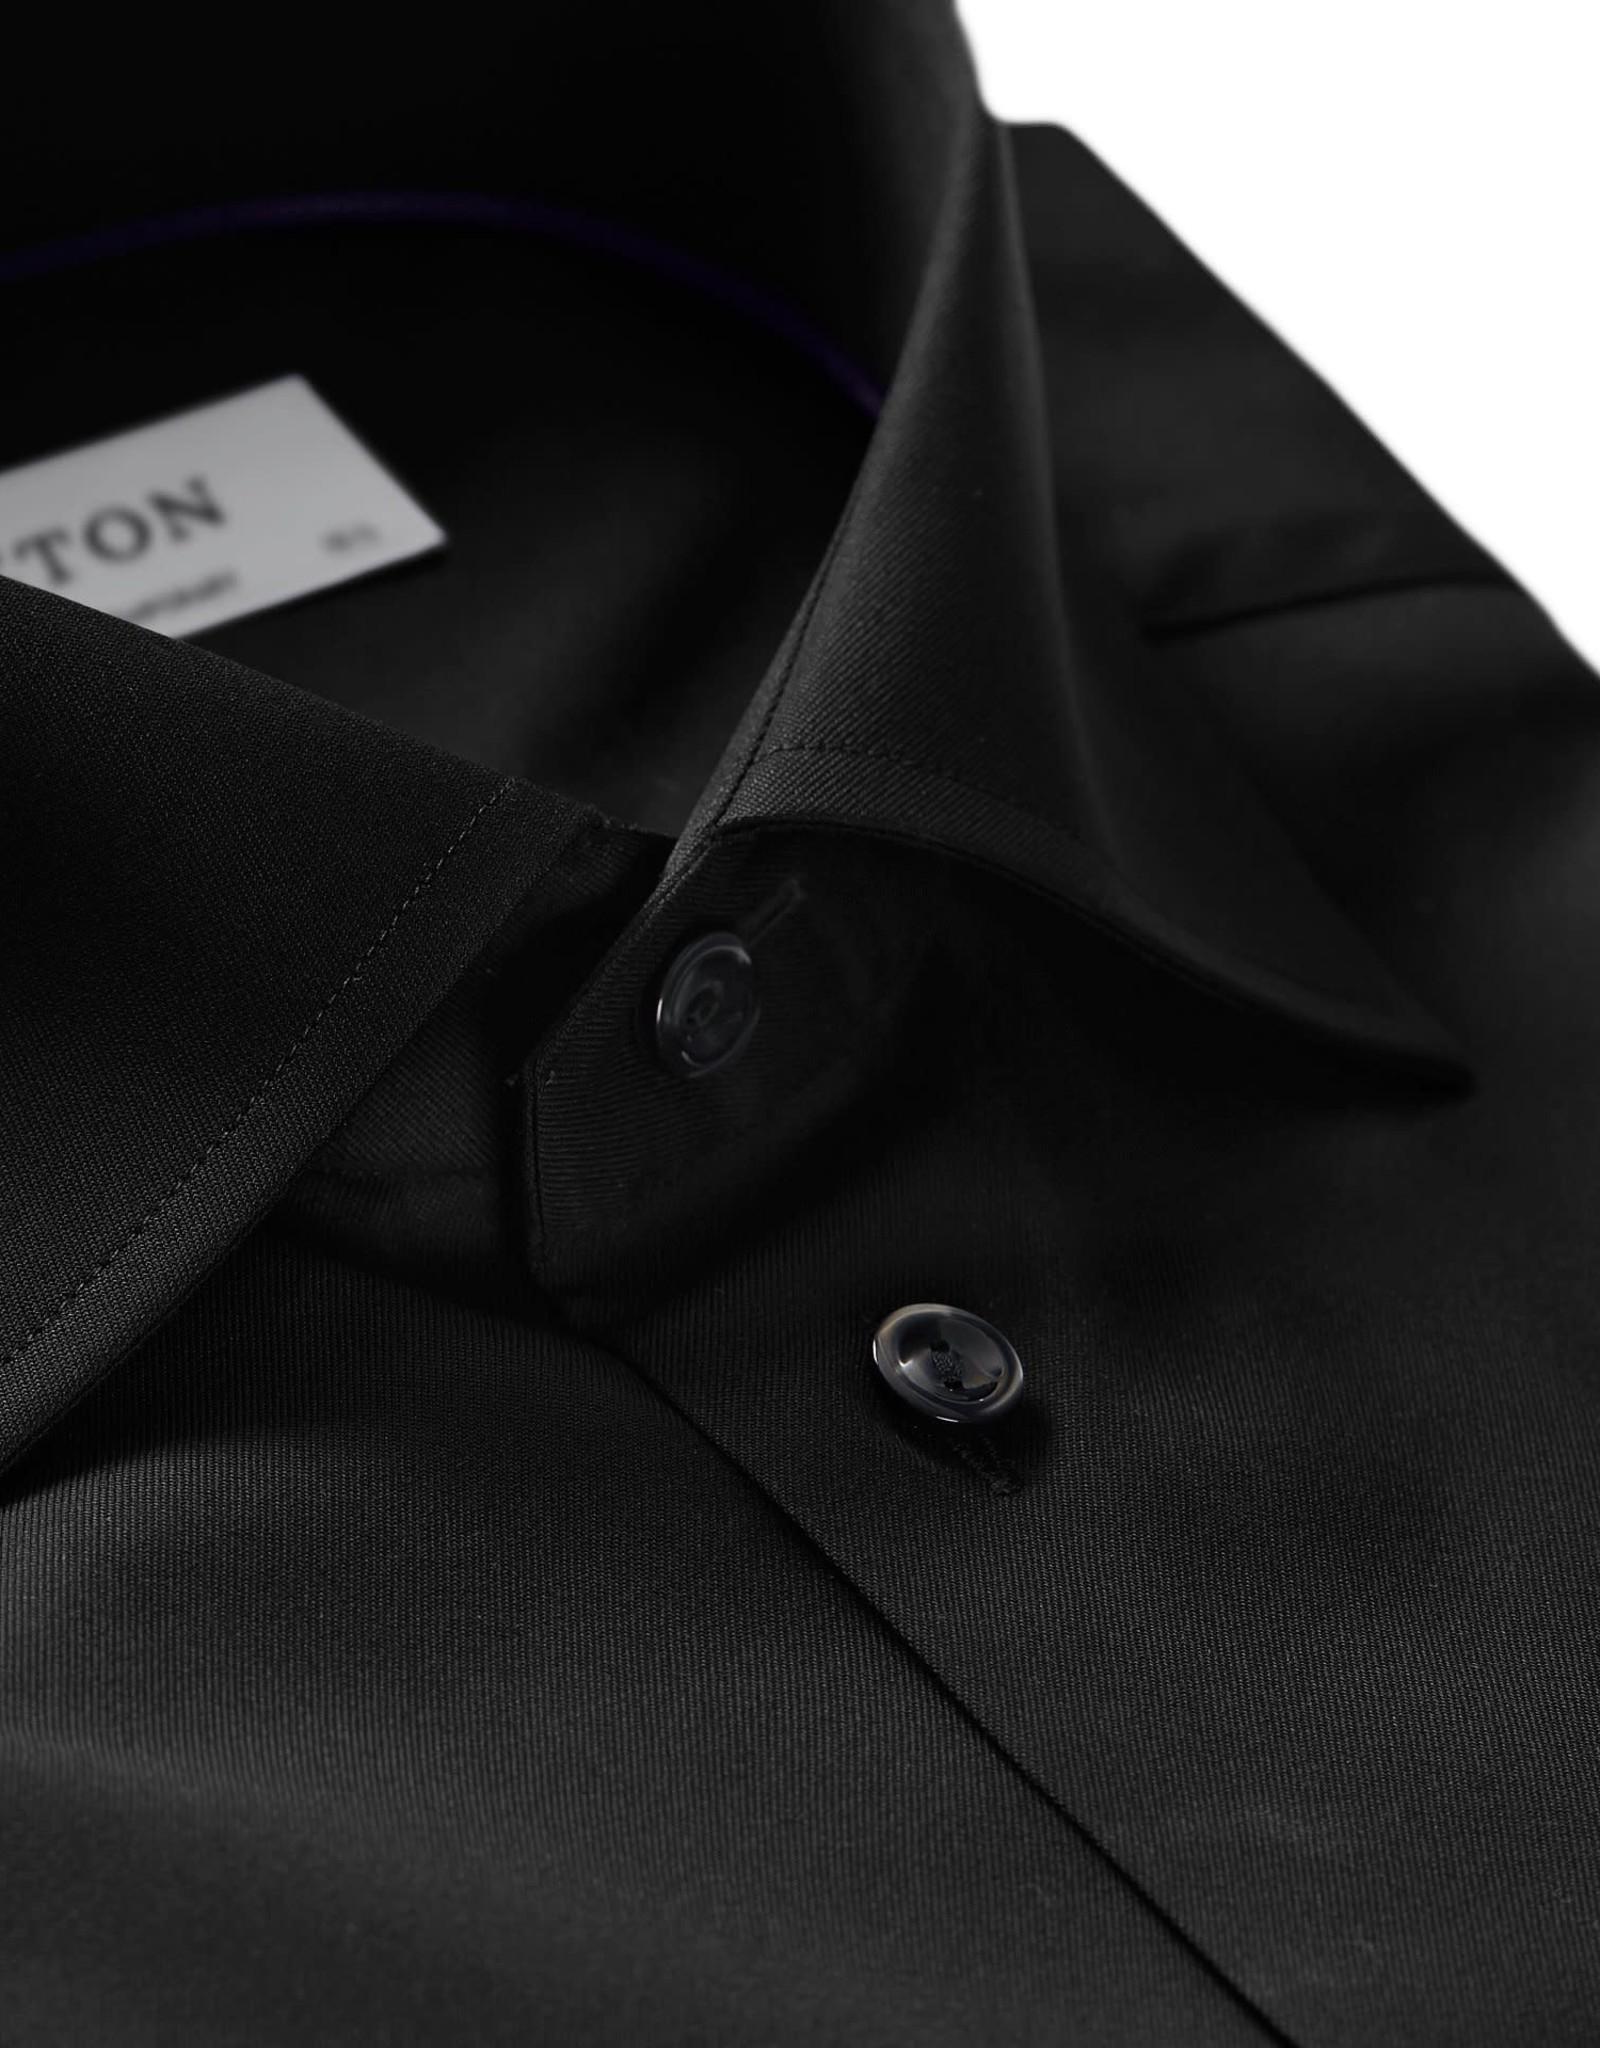 Eton Eton hemd zwart contemporary 3000-79311/18